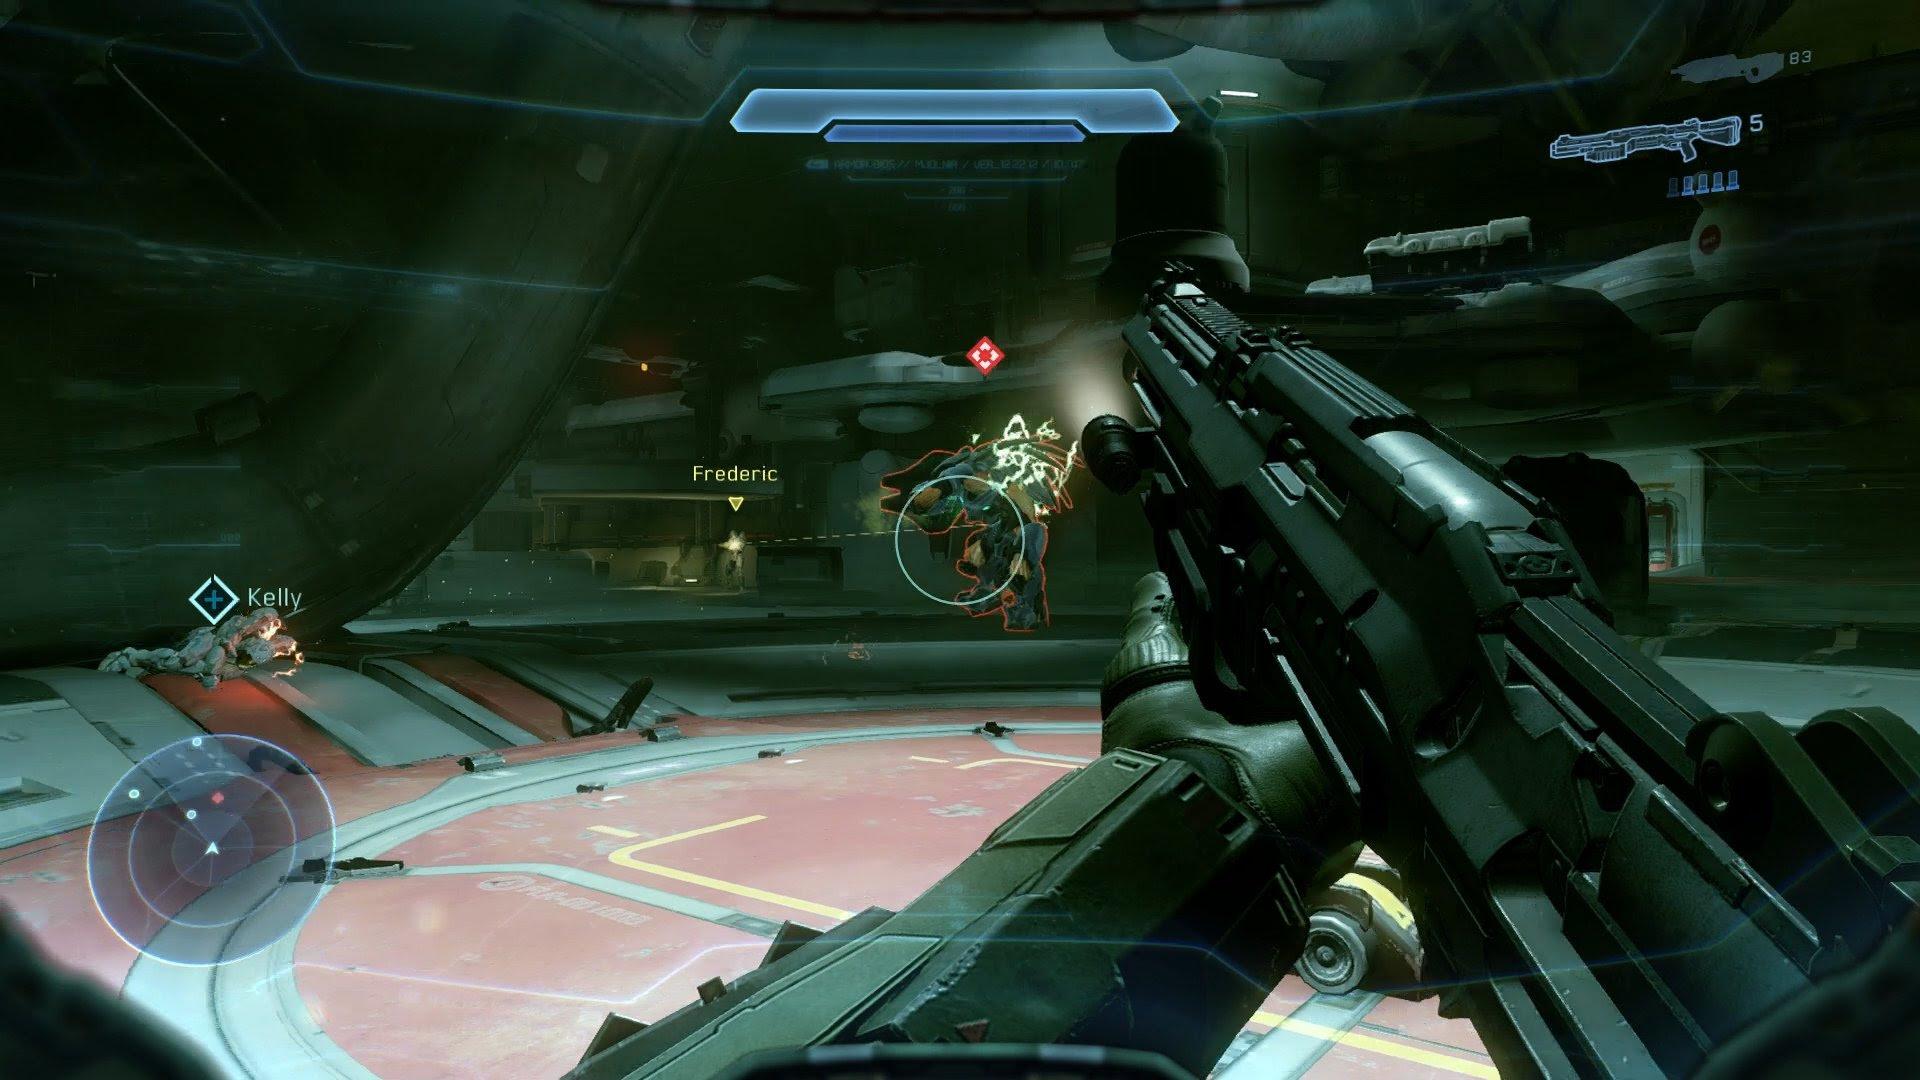 Descargar Juegos Halo 4 Dwiyokos